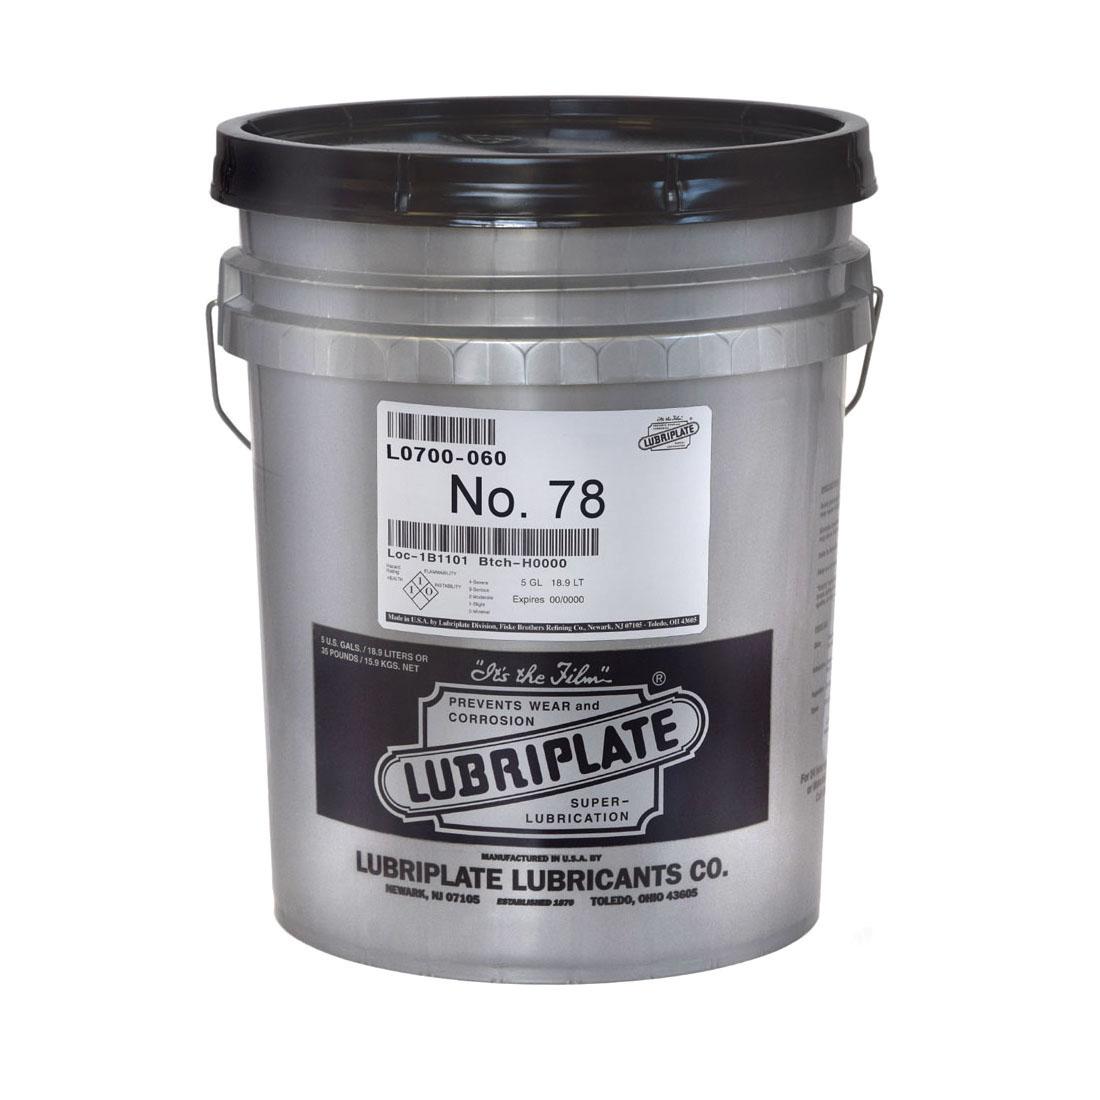 Lubriplate® L0700-060 NO 78 Machine Oil, 5 gal Pail, Mineral Oil Odor/Scent, Liquid Form, Amber